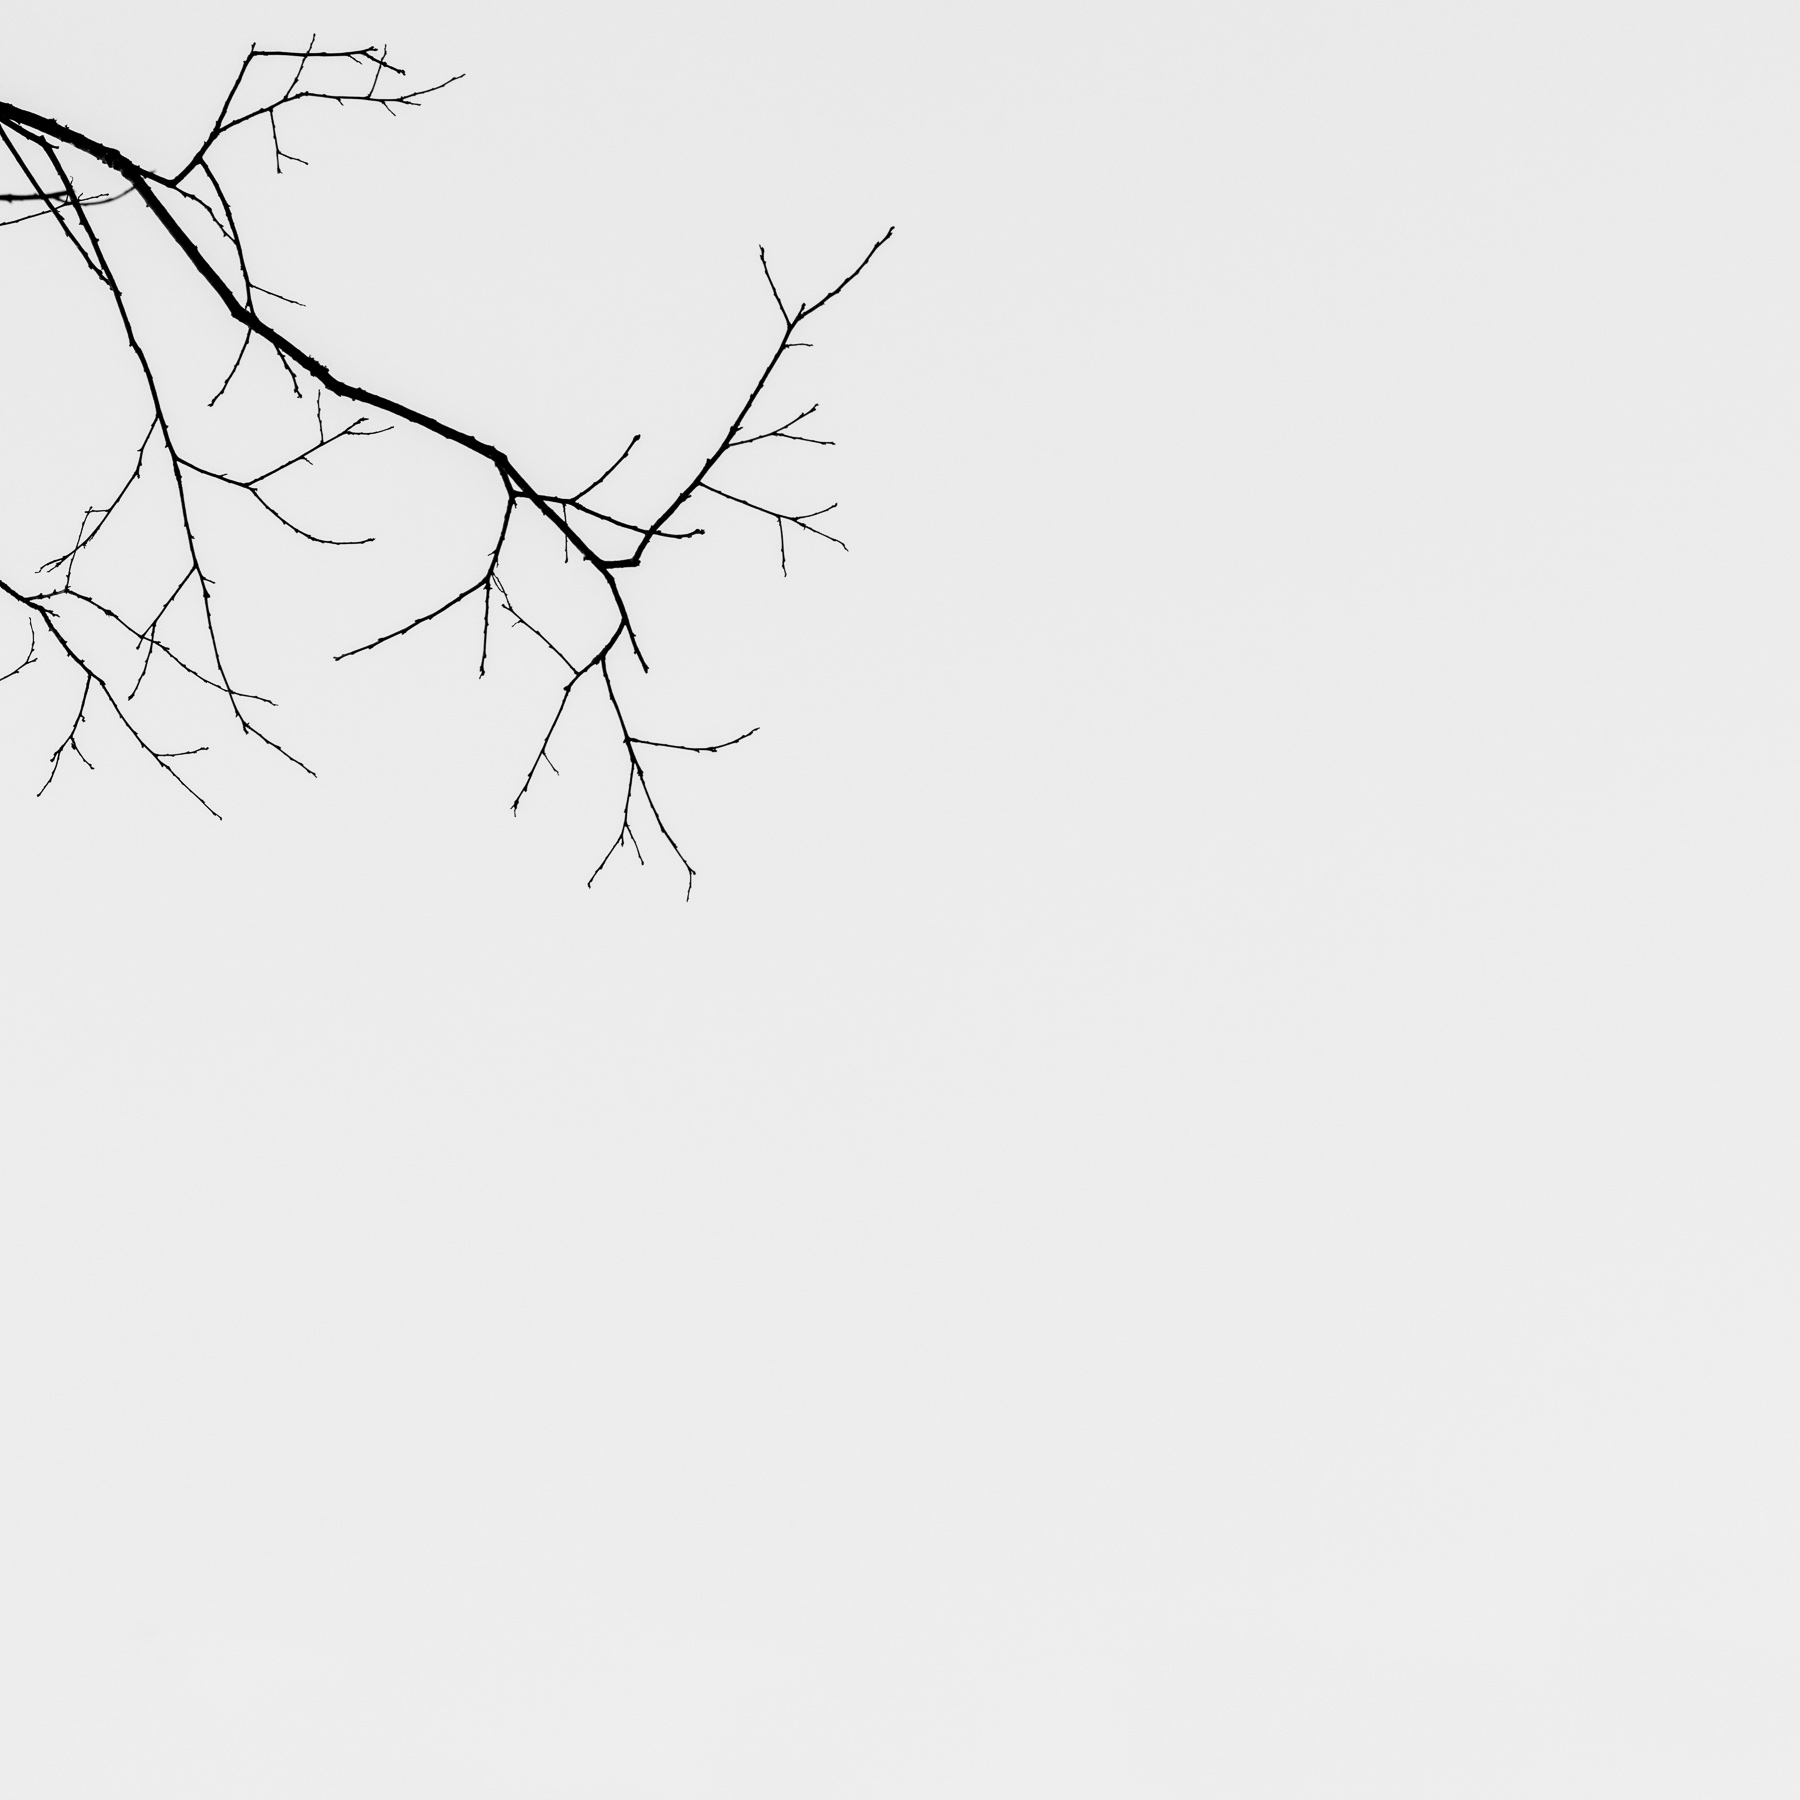 Mauzy-Tree-1.jpg